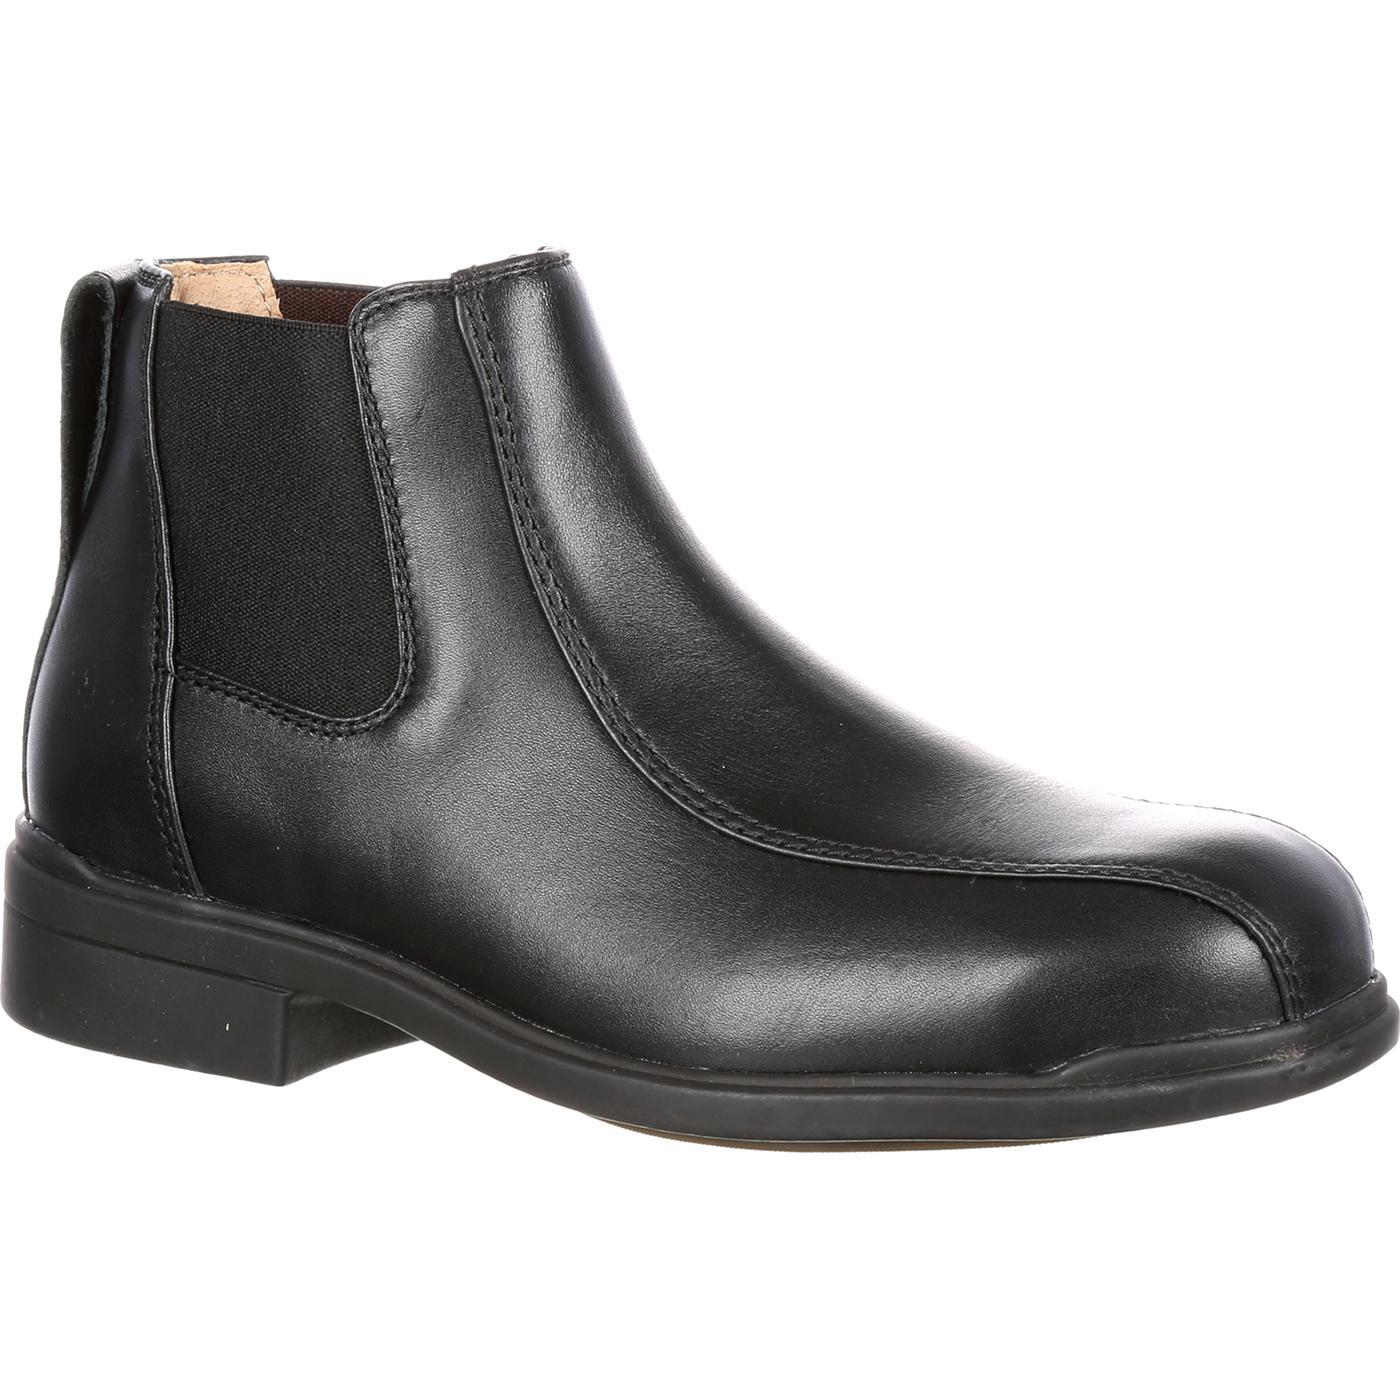 Blundstone Executive Steel Toe Dress Work Shoe. BLU782